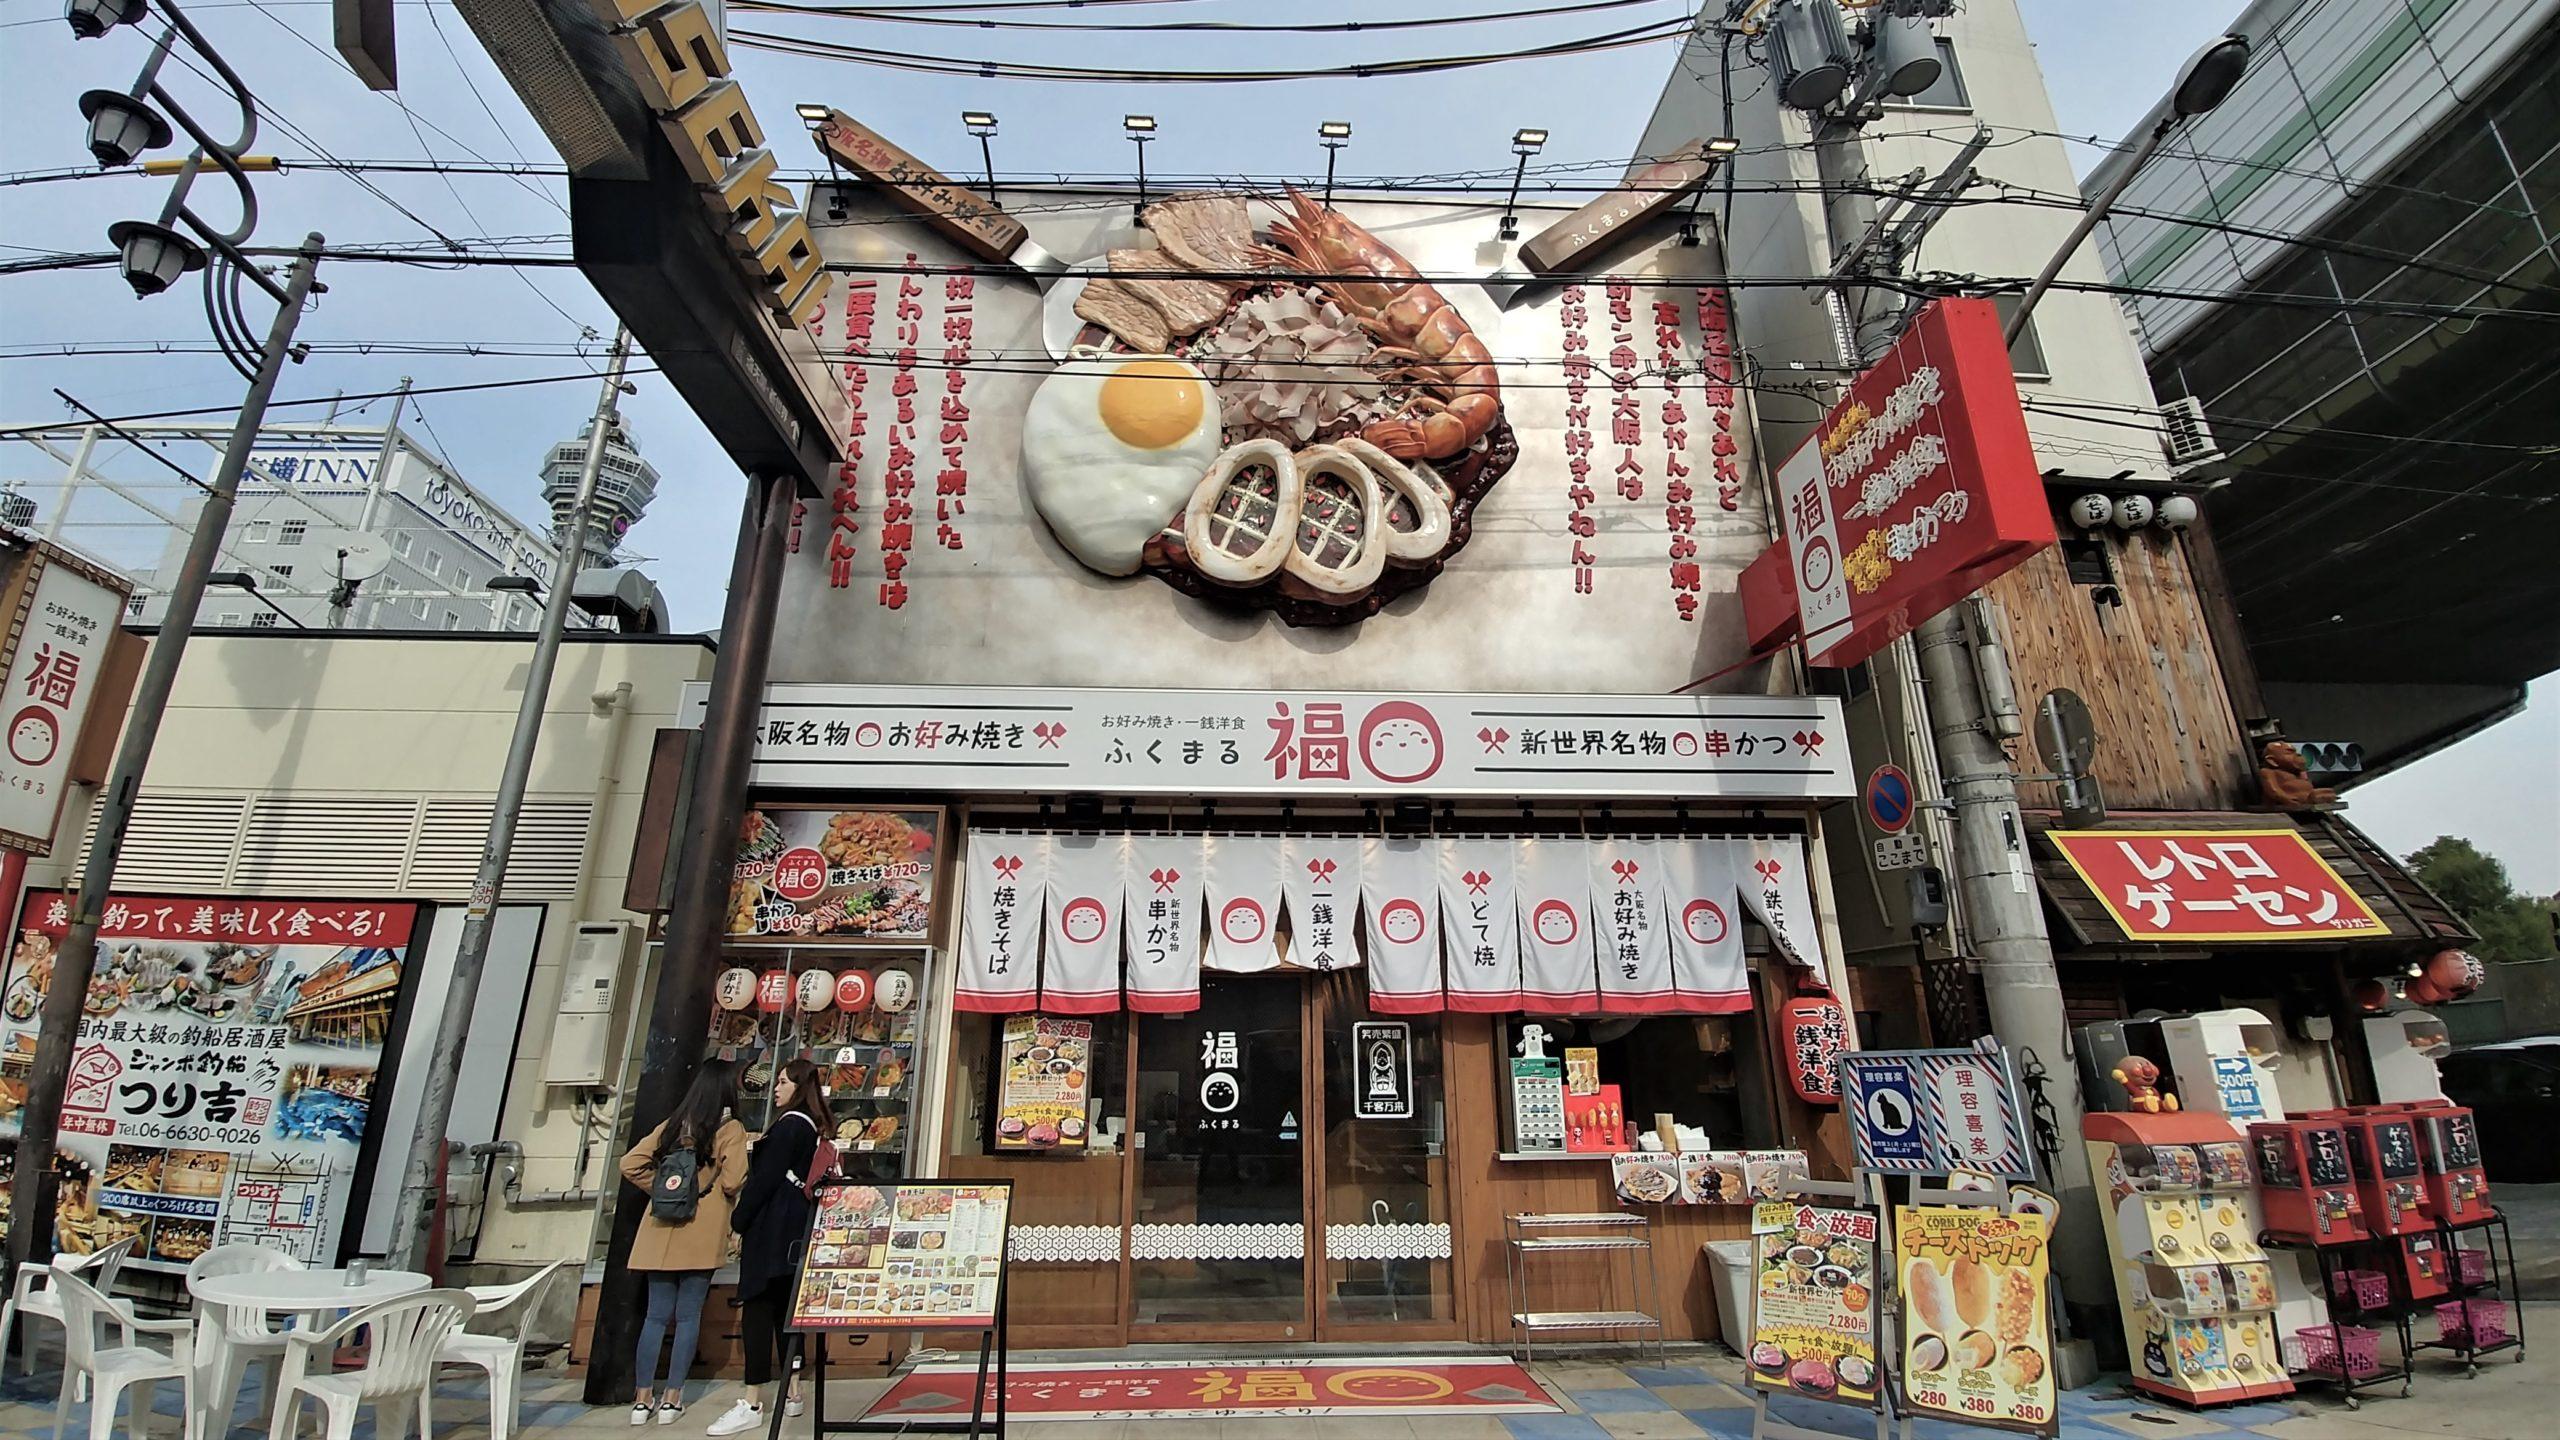 osaka visiter shinsekai autome momiji blog voyage japon arpenter le chemin